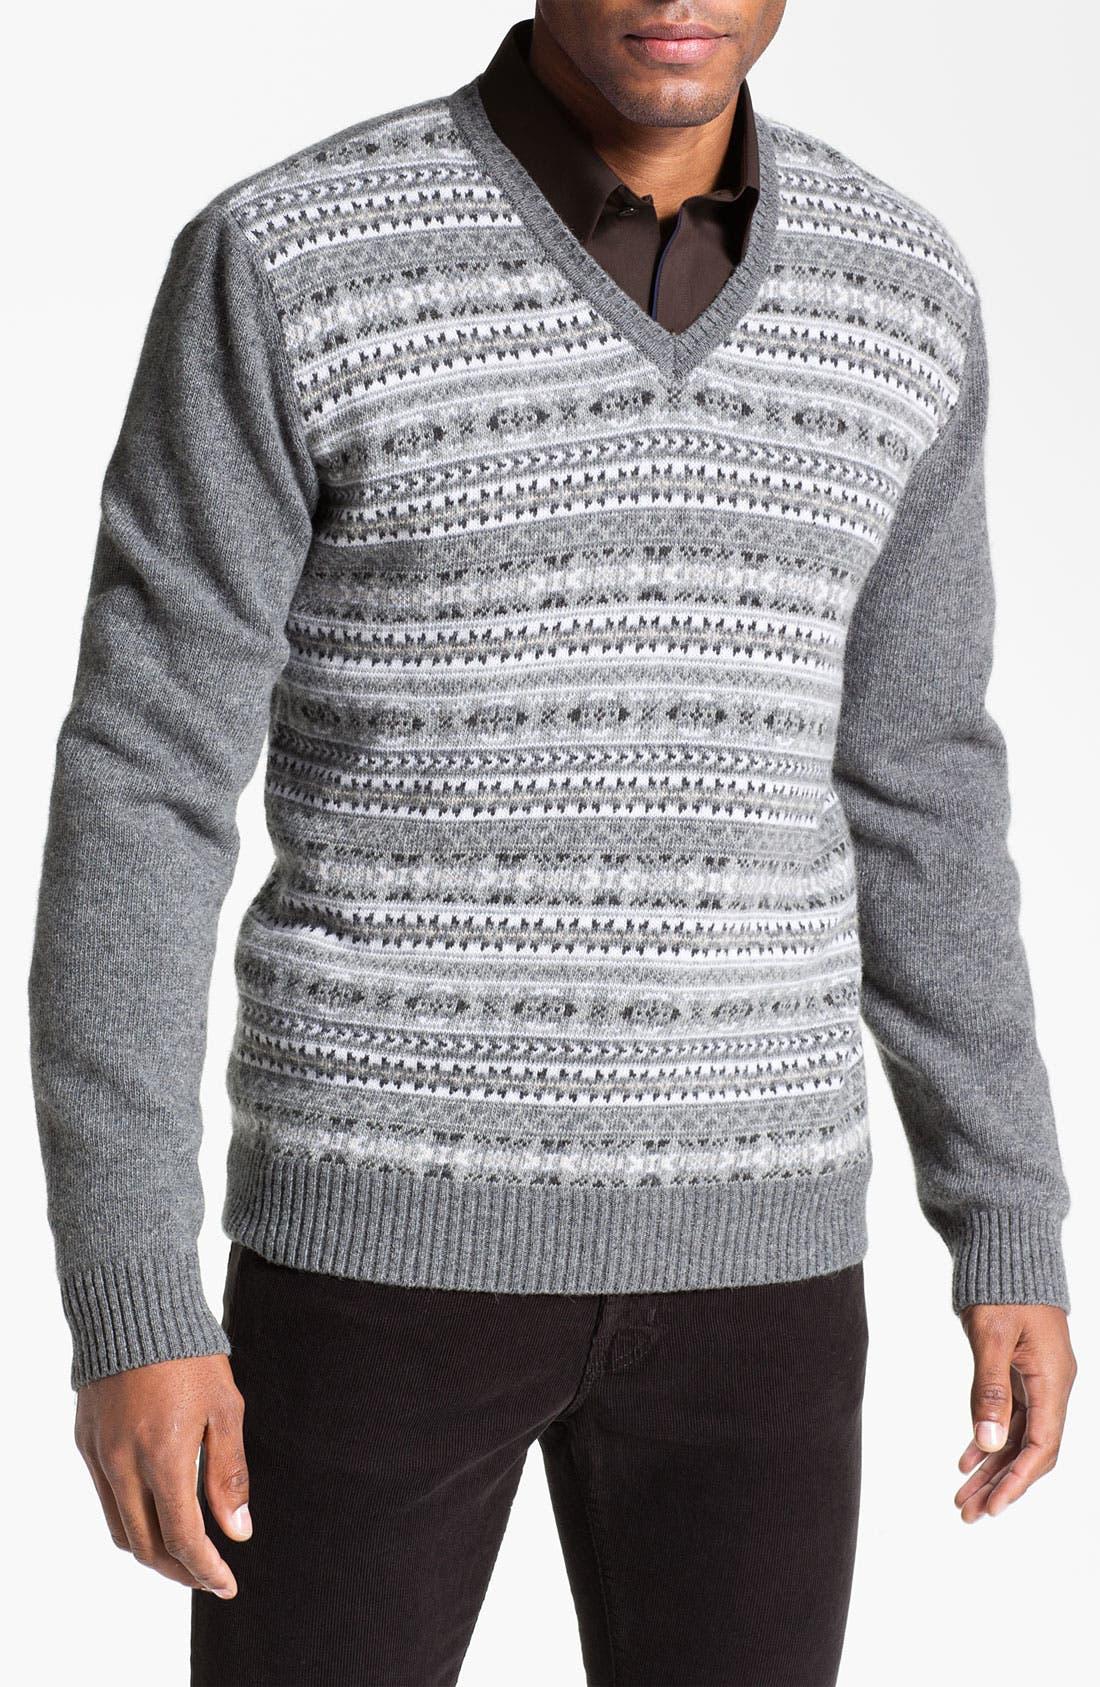 Main Image - Fiesole Wool Blend V-Neck Sweater